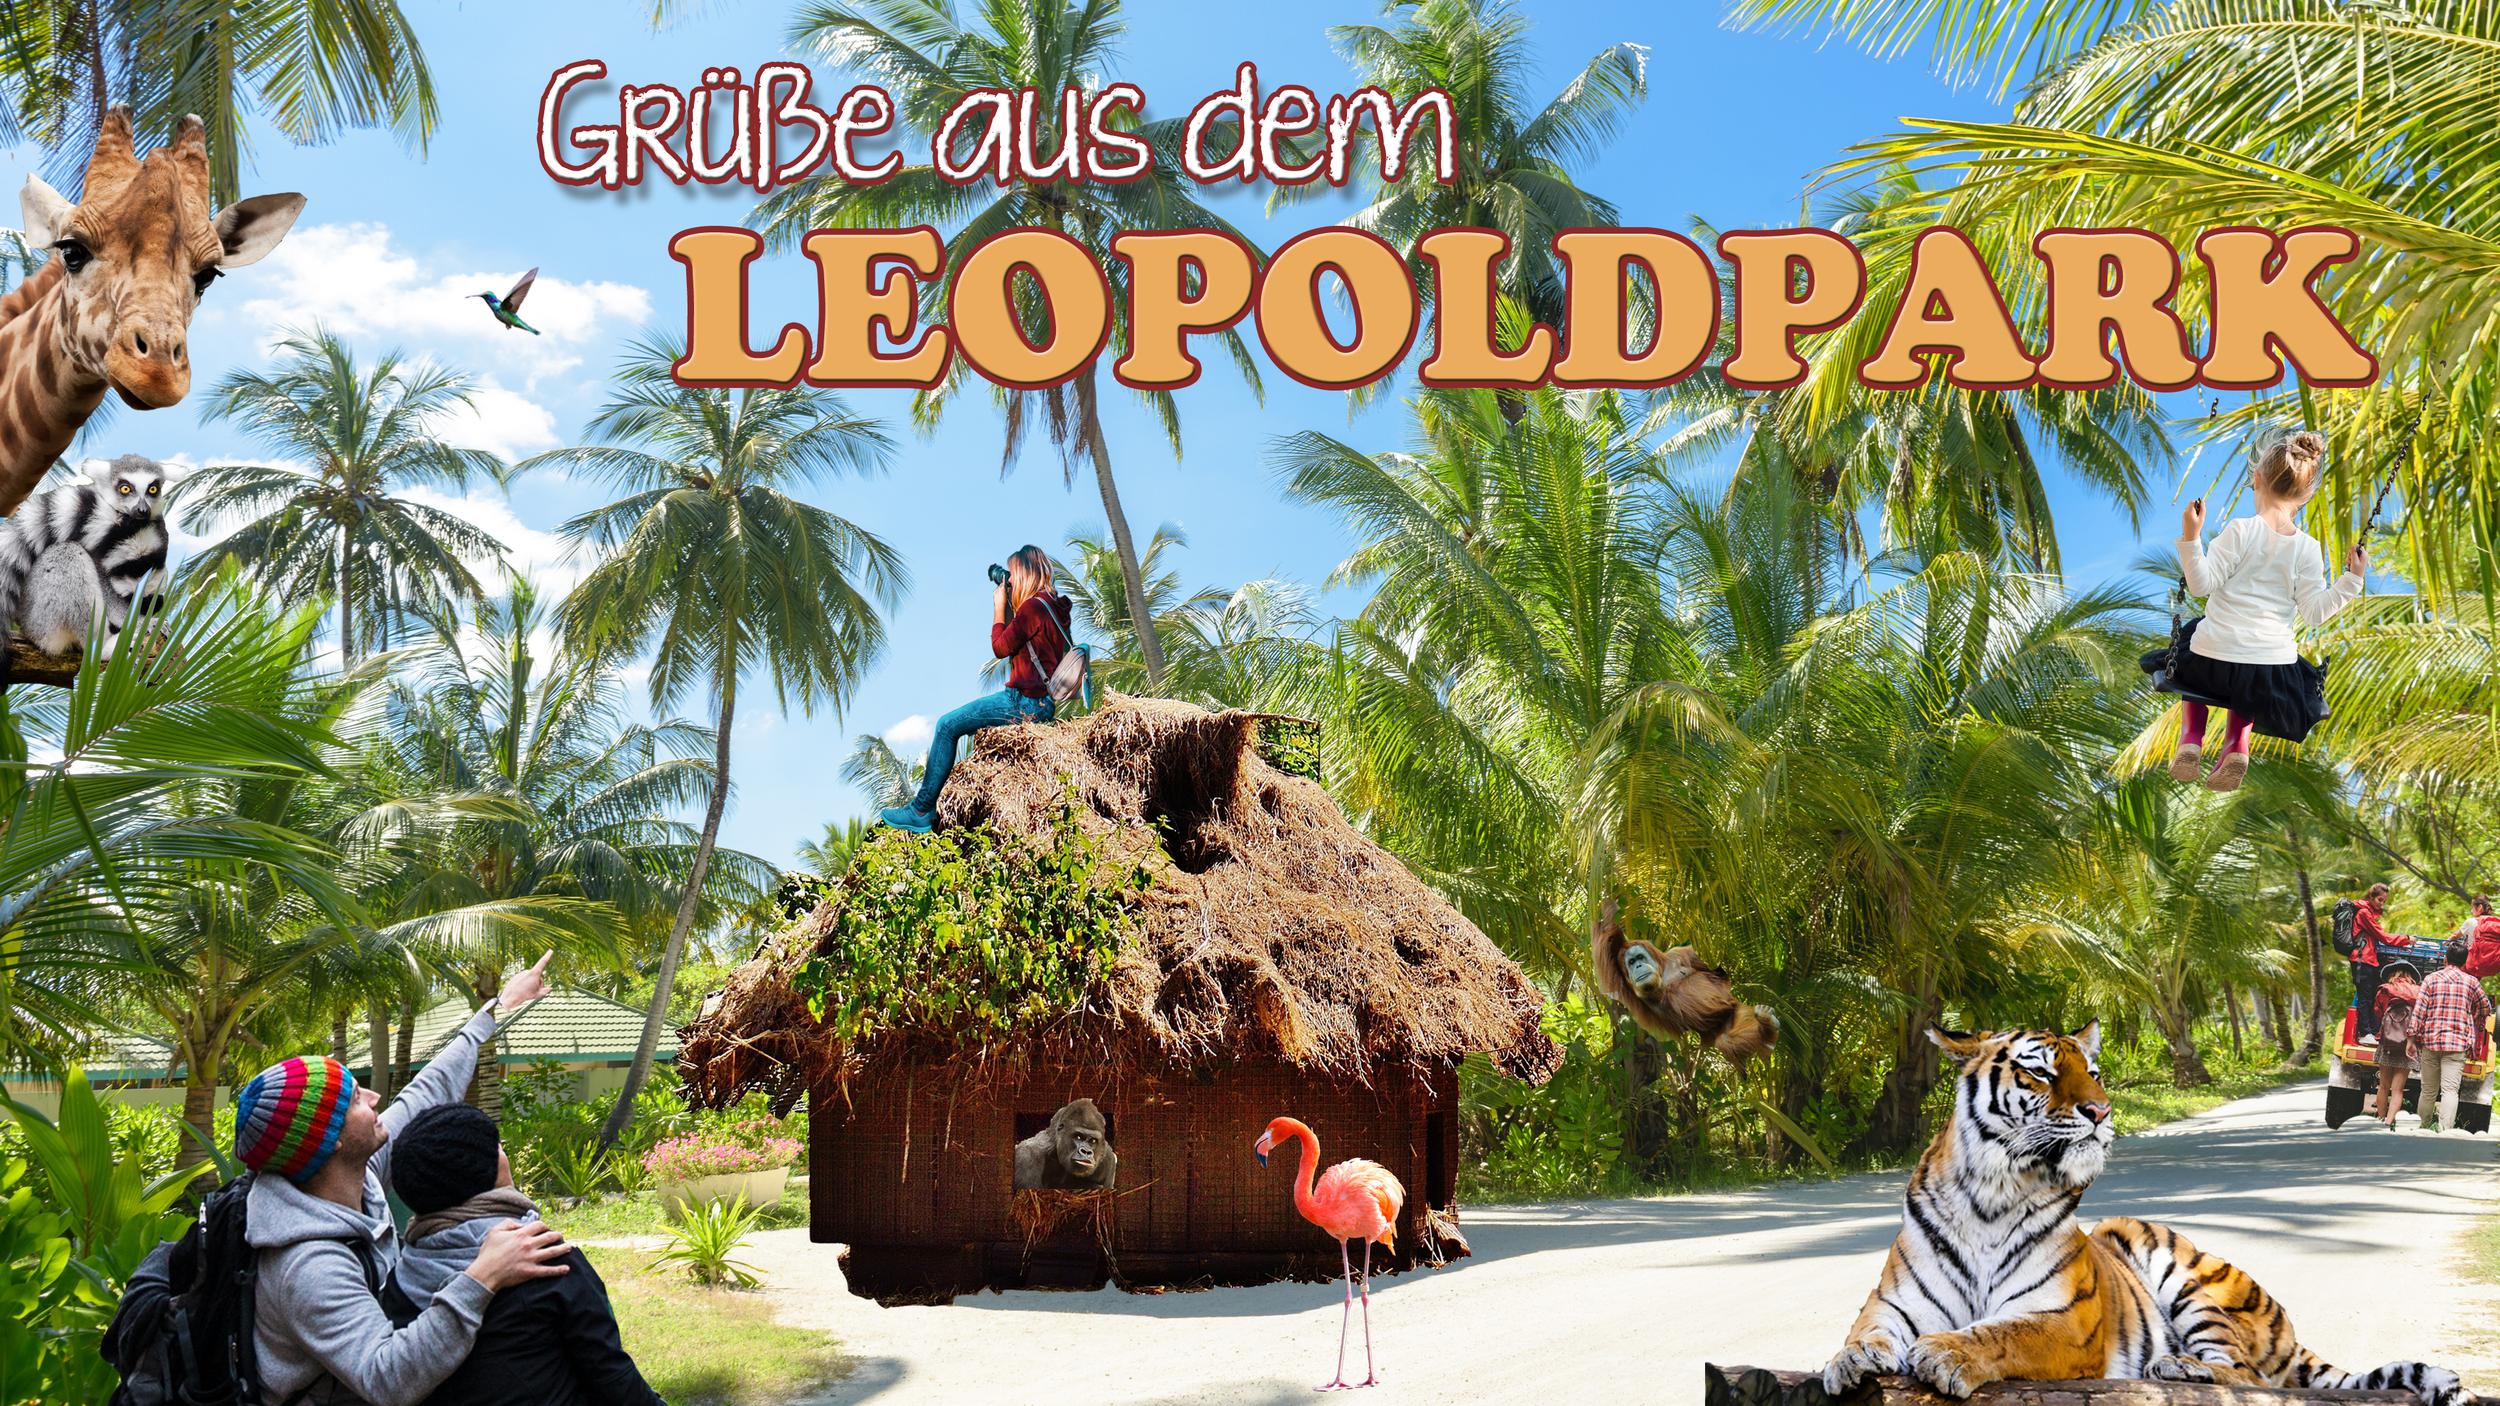 Leopoldpostcard.png